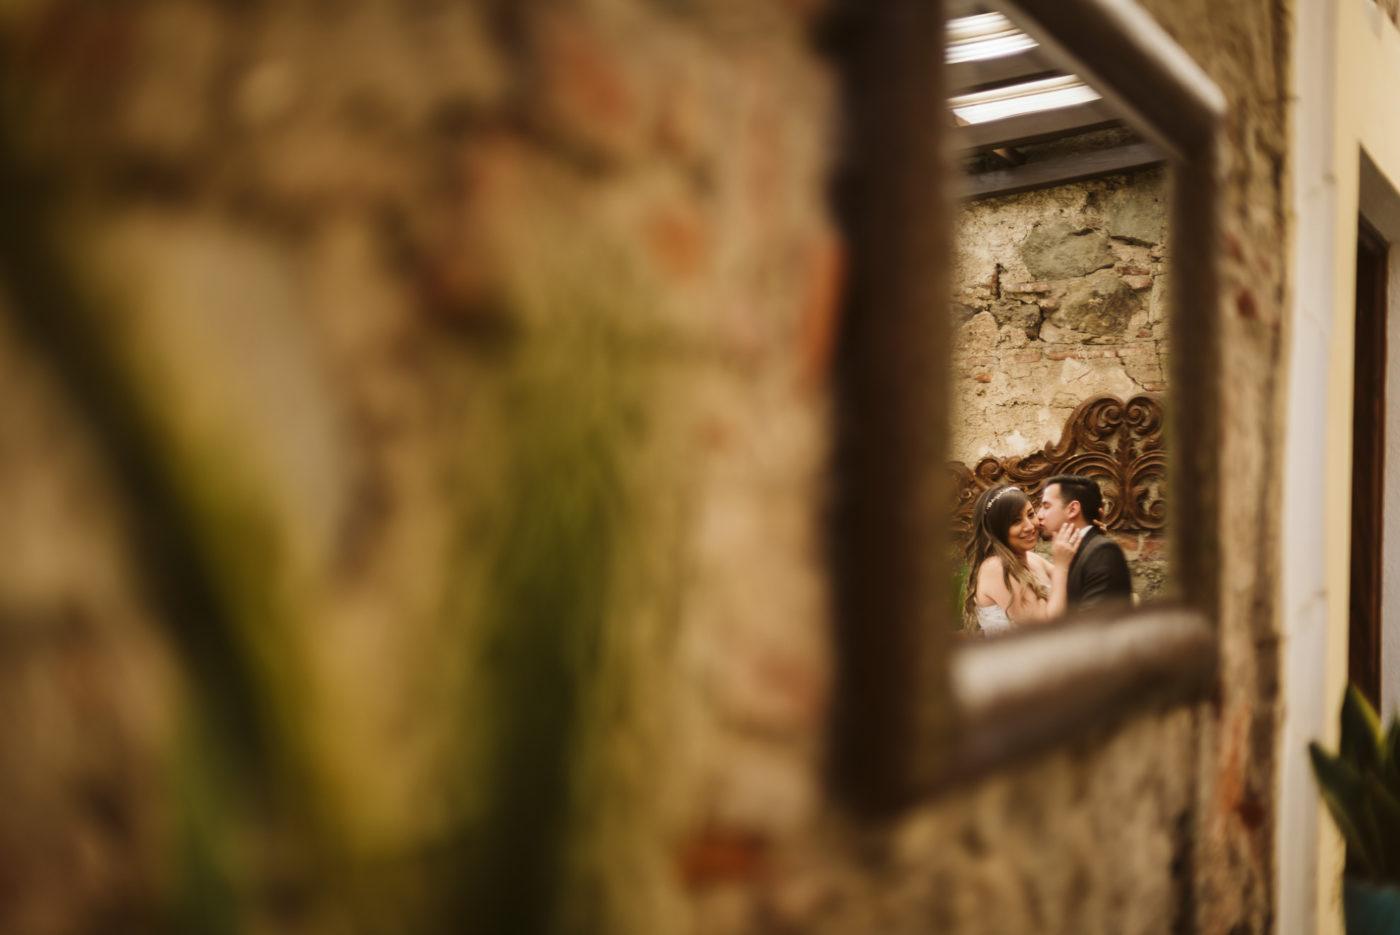 Boda-David_y_lorena-Anigua_Guatemala-Verde_Eventos-Bodas_Juan_Salazar-fotografo_de_bodas-Guatemala-fotografo-wedinguatemala-juansalazarphoto